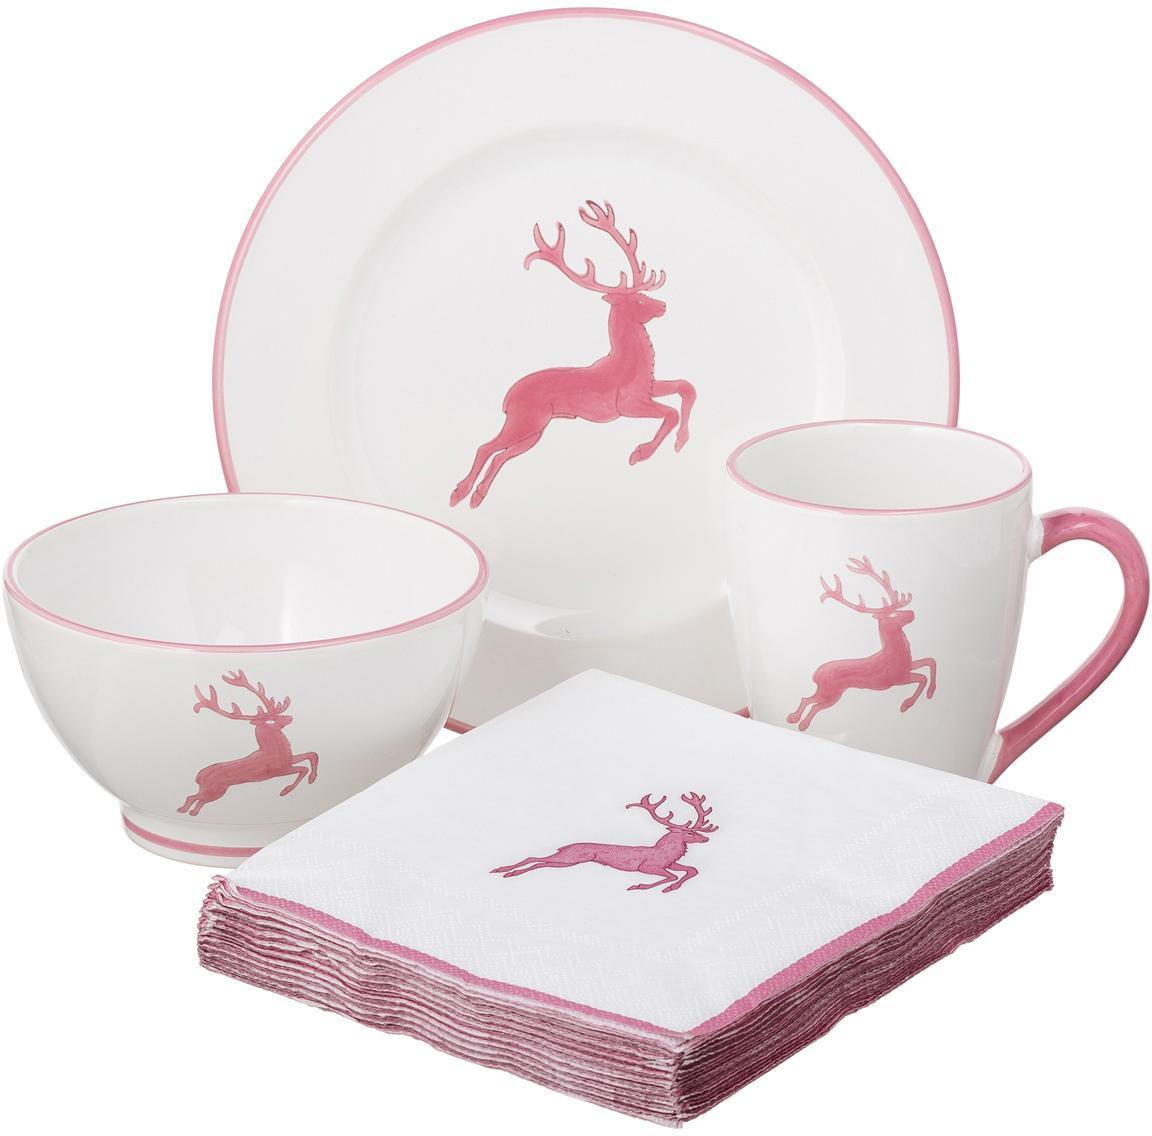 Set de desayuno artesanal Rosa Gourmet Deer, 4pzas., Cerámica, Rosa, blanco, Set de diferentes tamaños